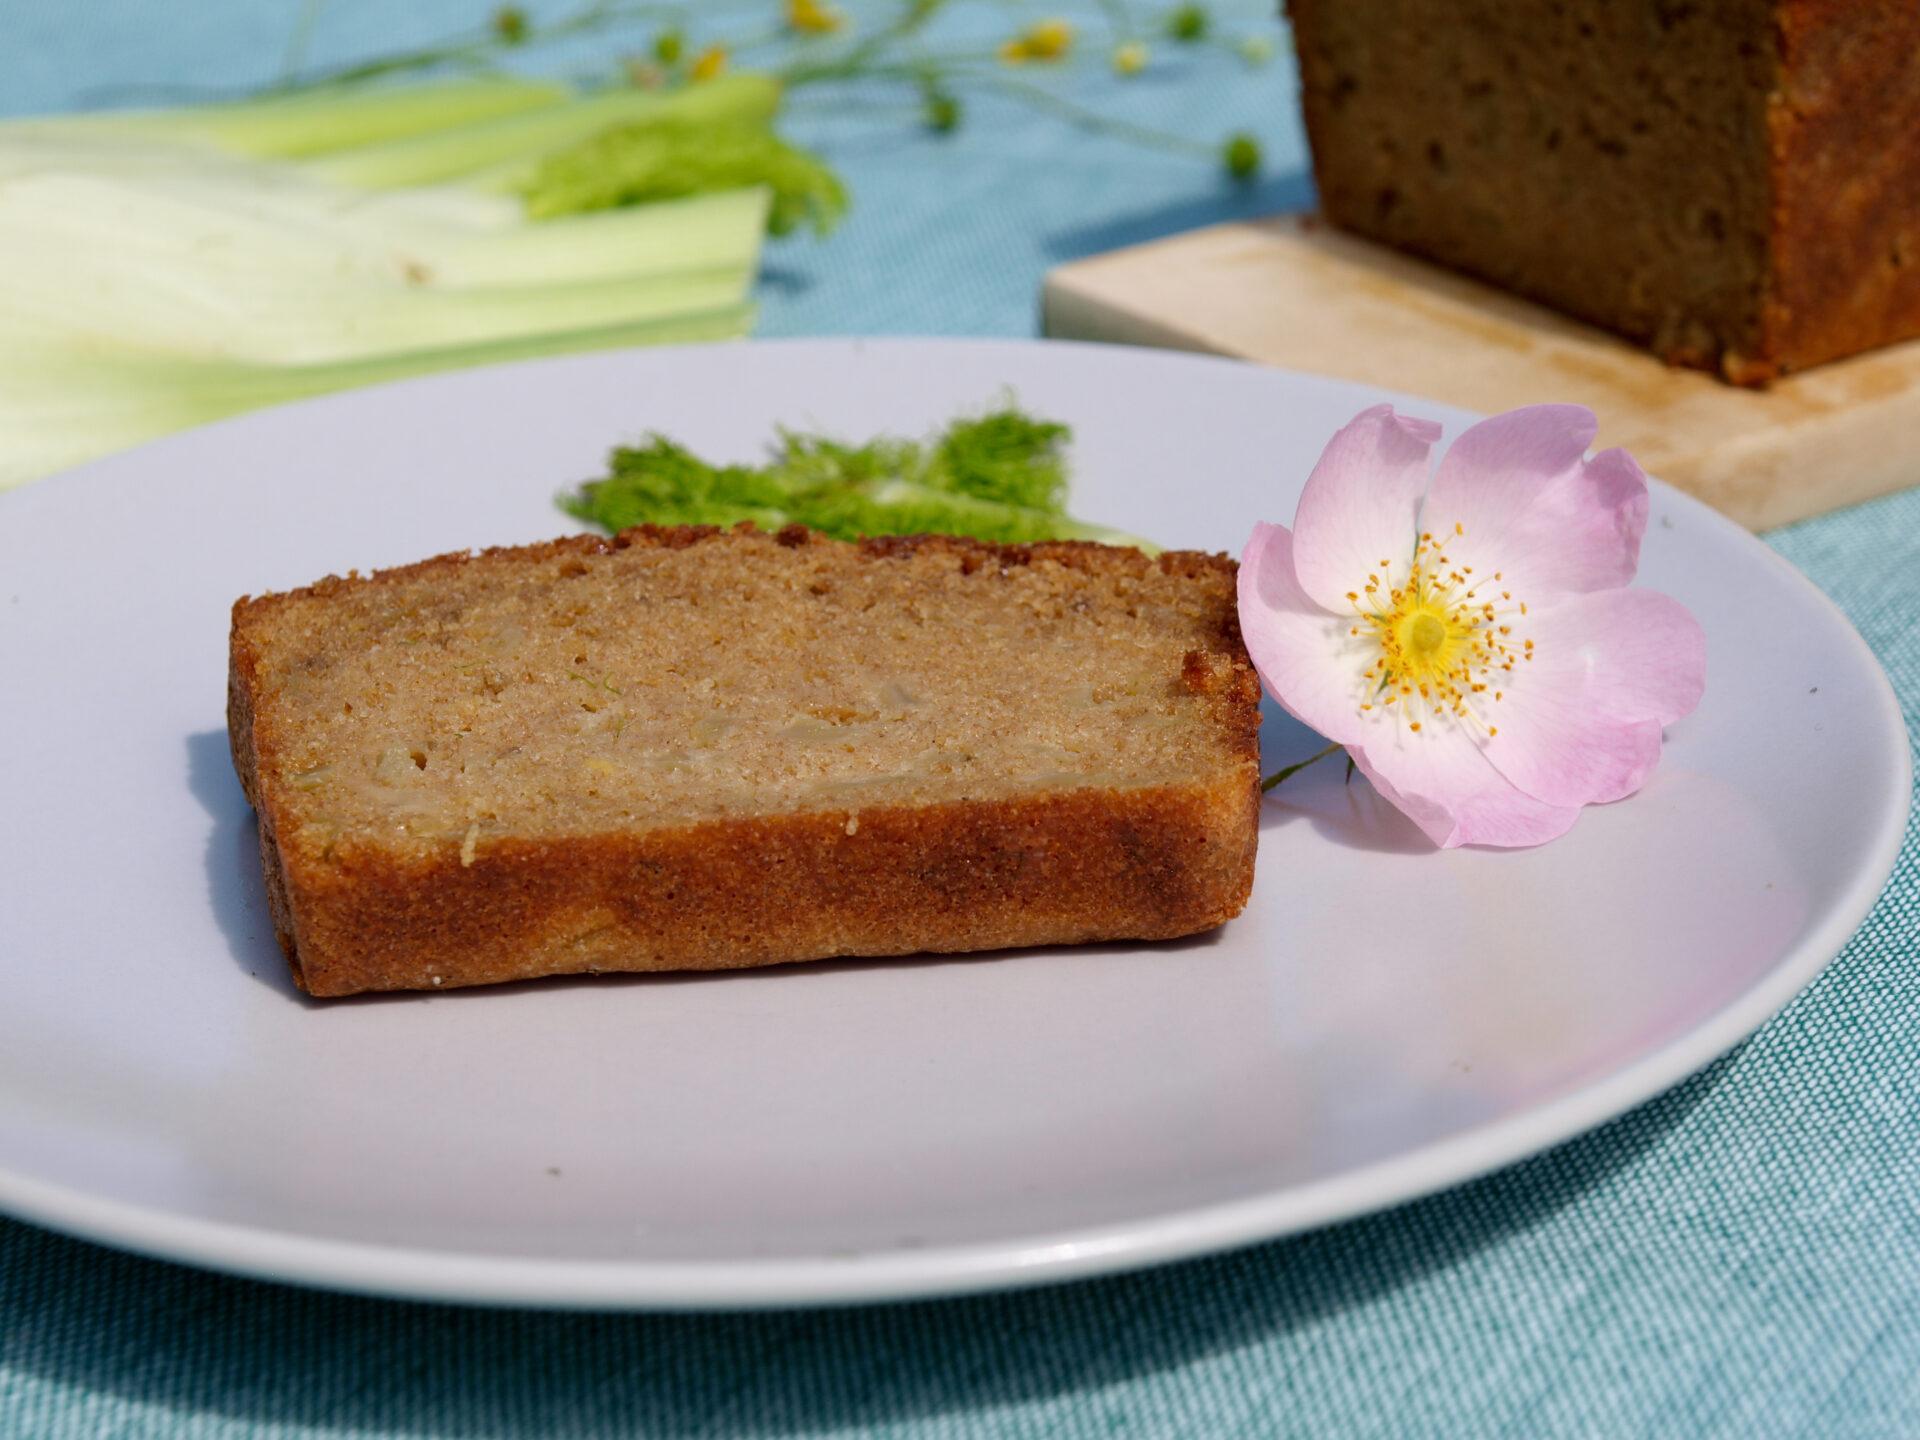 süsser Fenchel-Cake aus Dinkelvollkornmehl (Foto: Sarah, 2021)